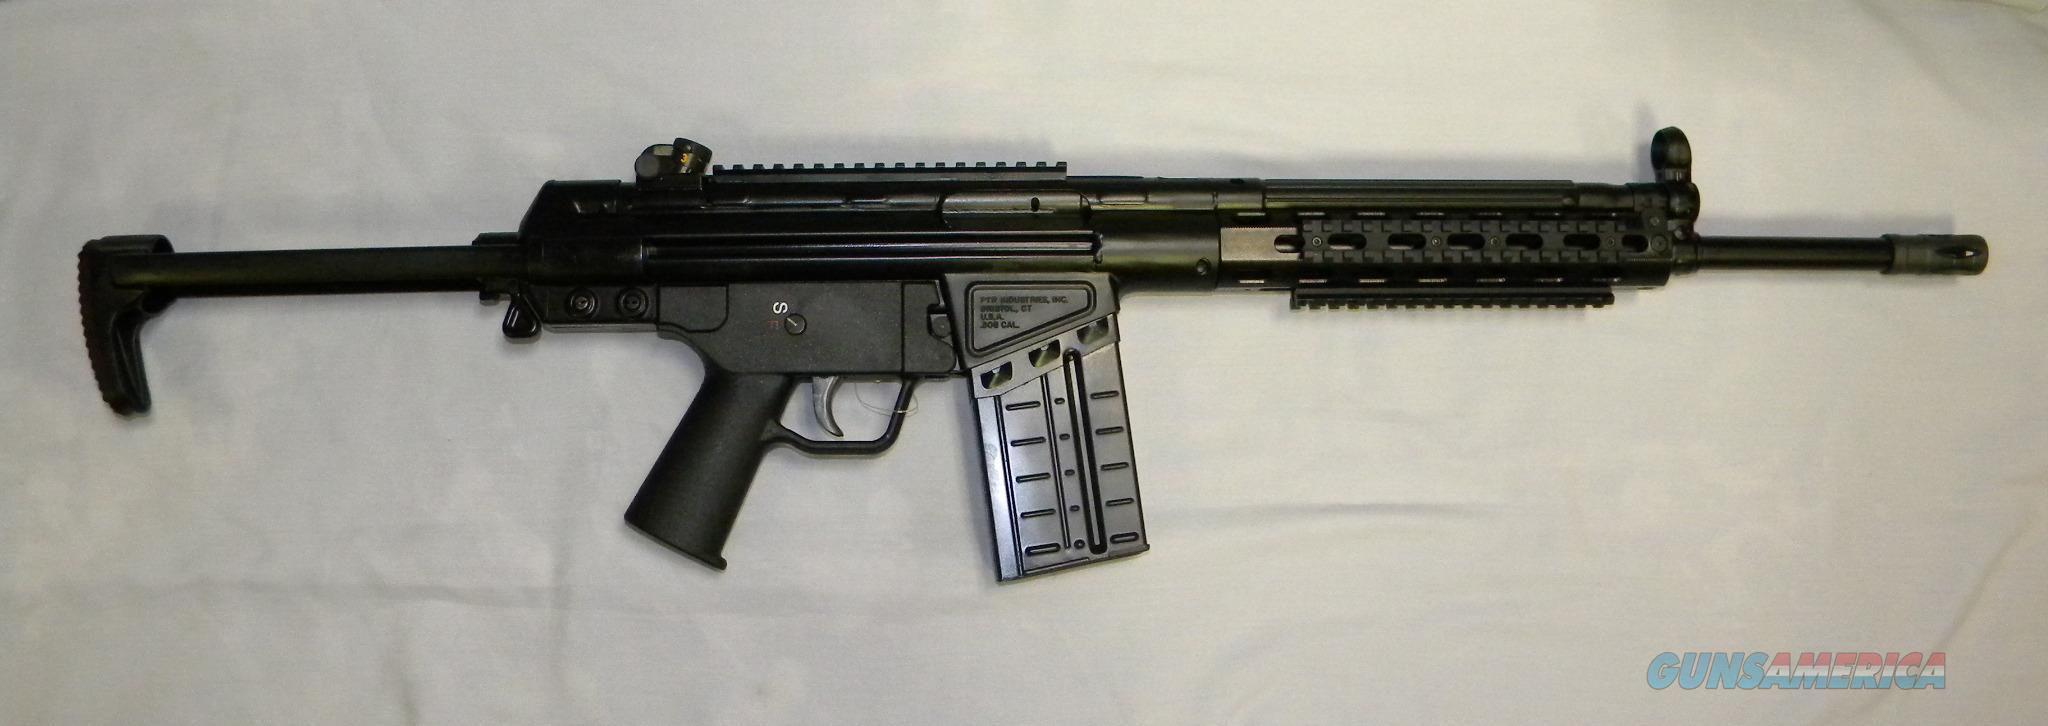 PTR-91 KPFR, .308 Paratrooper, Collapsing Stock  Guns > Rifles > Century International Arms - Rifles > Rifles